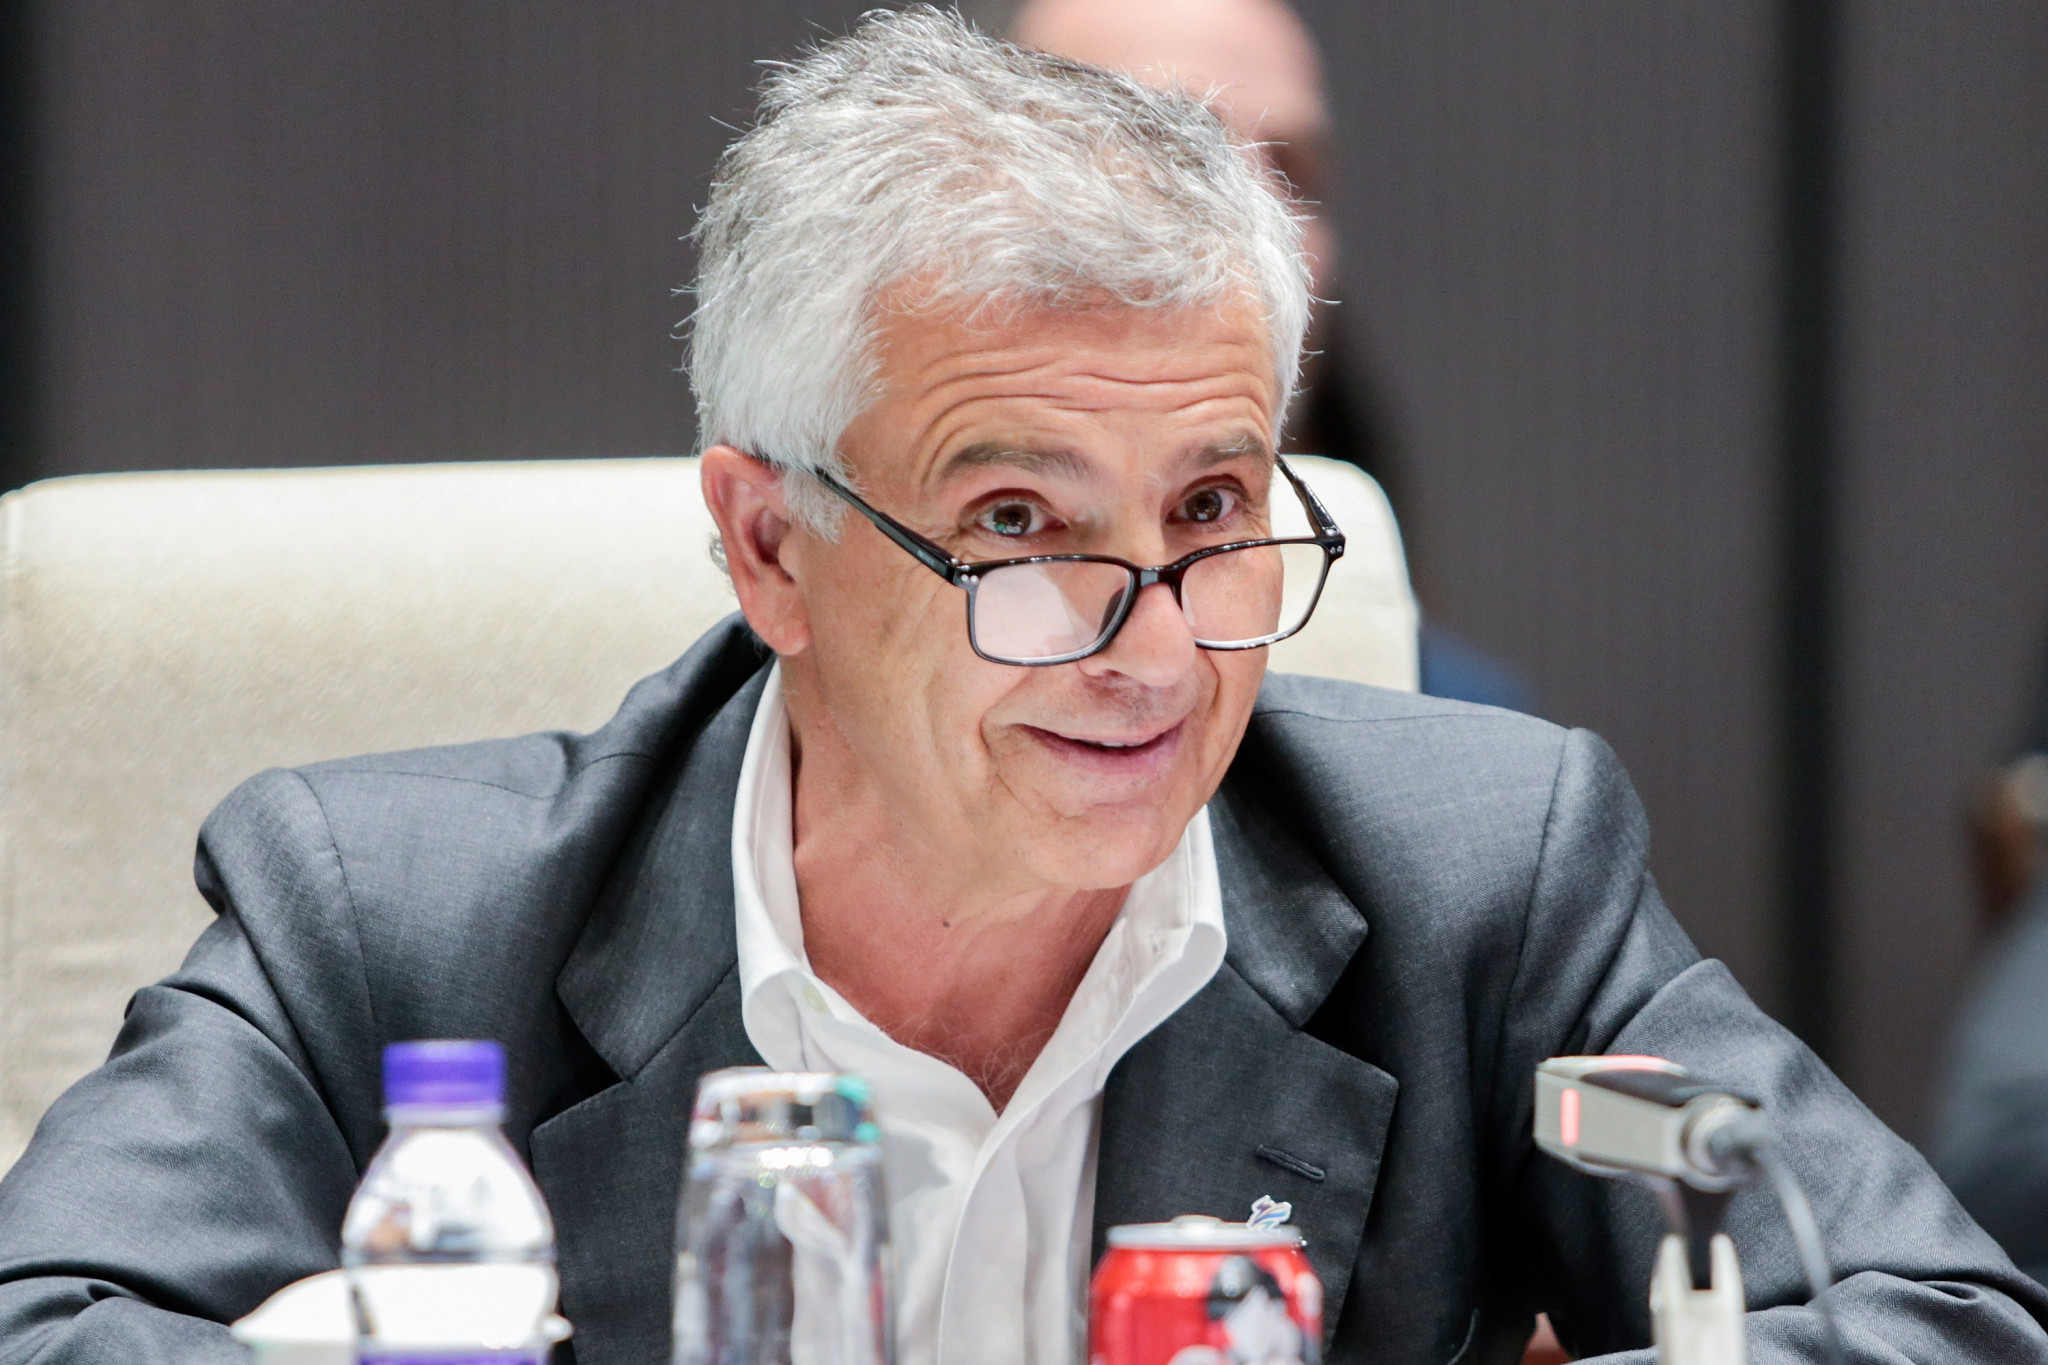 Samaranch praises enthusiasm for winter sport on Beijing 2022 visit